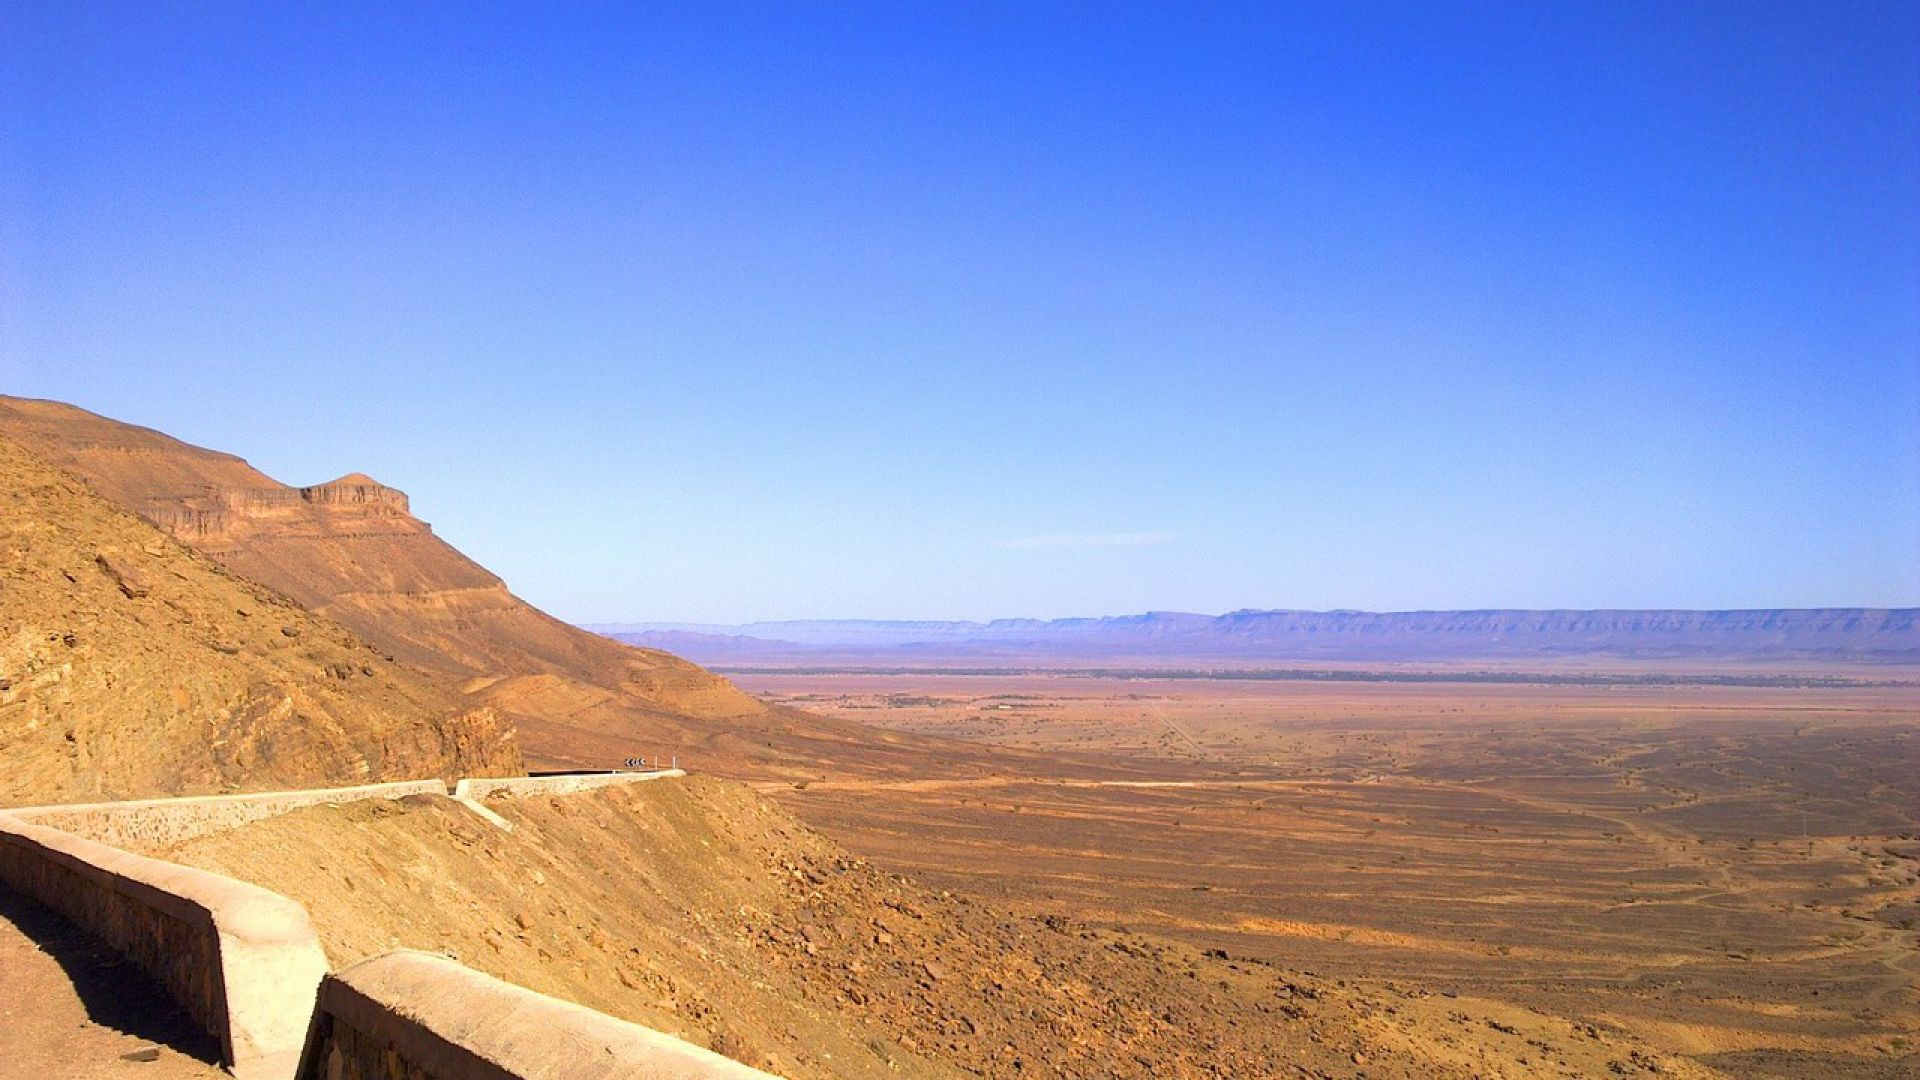 Immagine 139: In Marocco con la Yamaha Super Ténéré